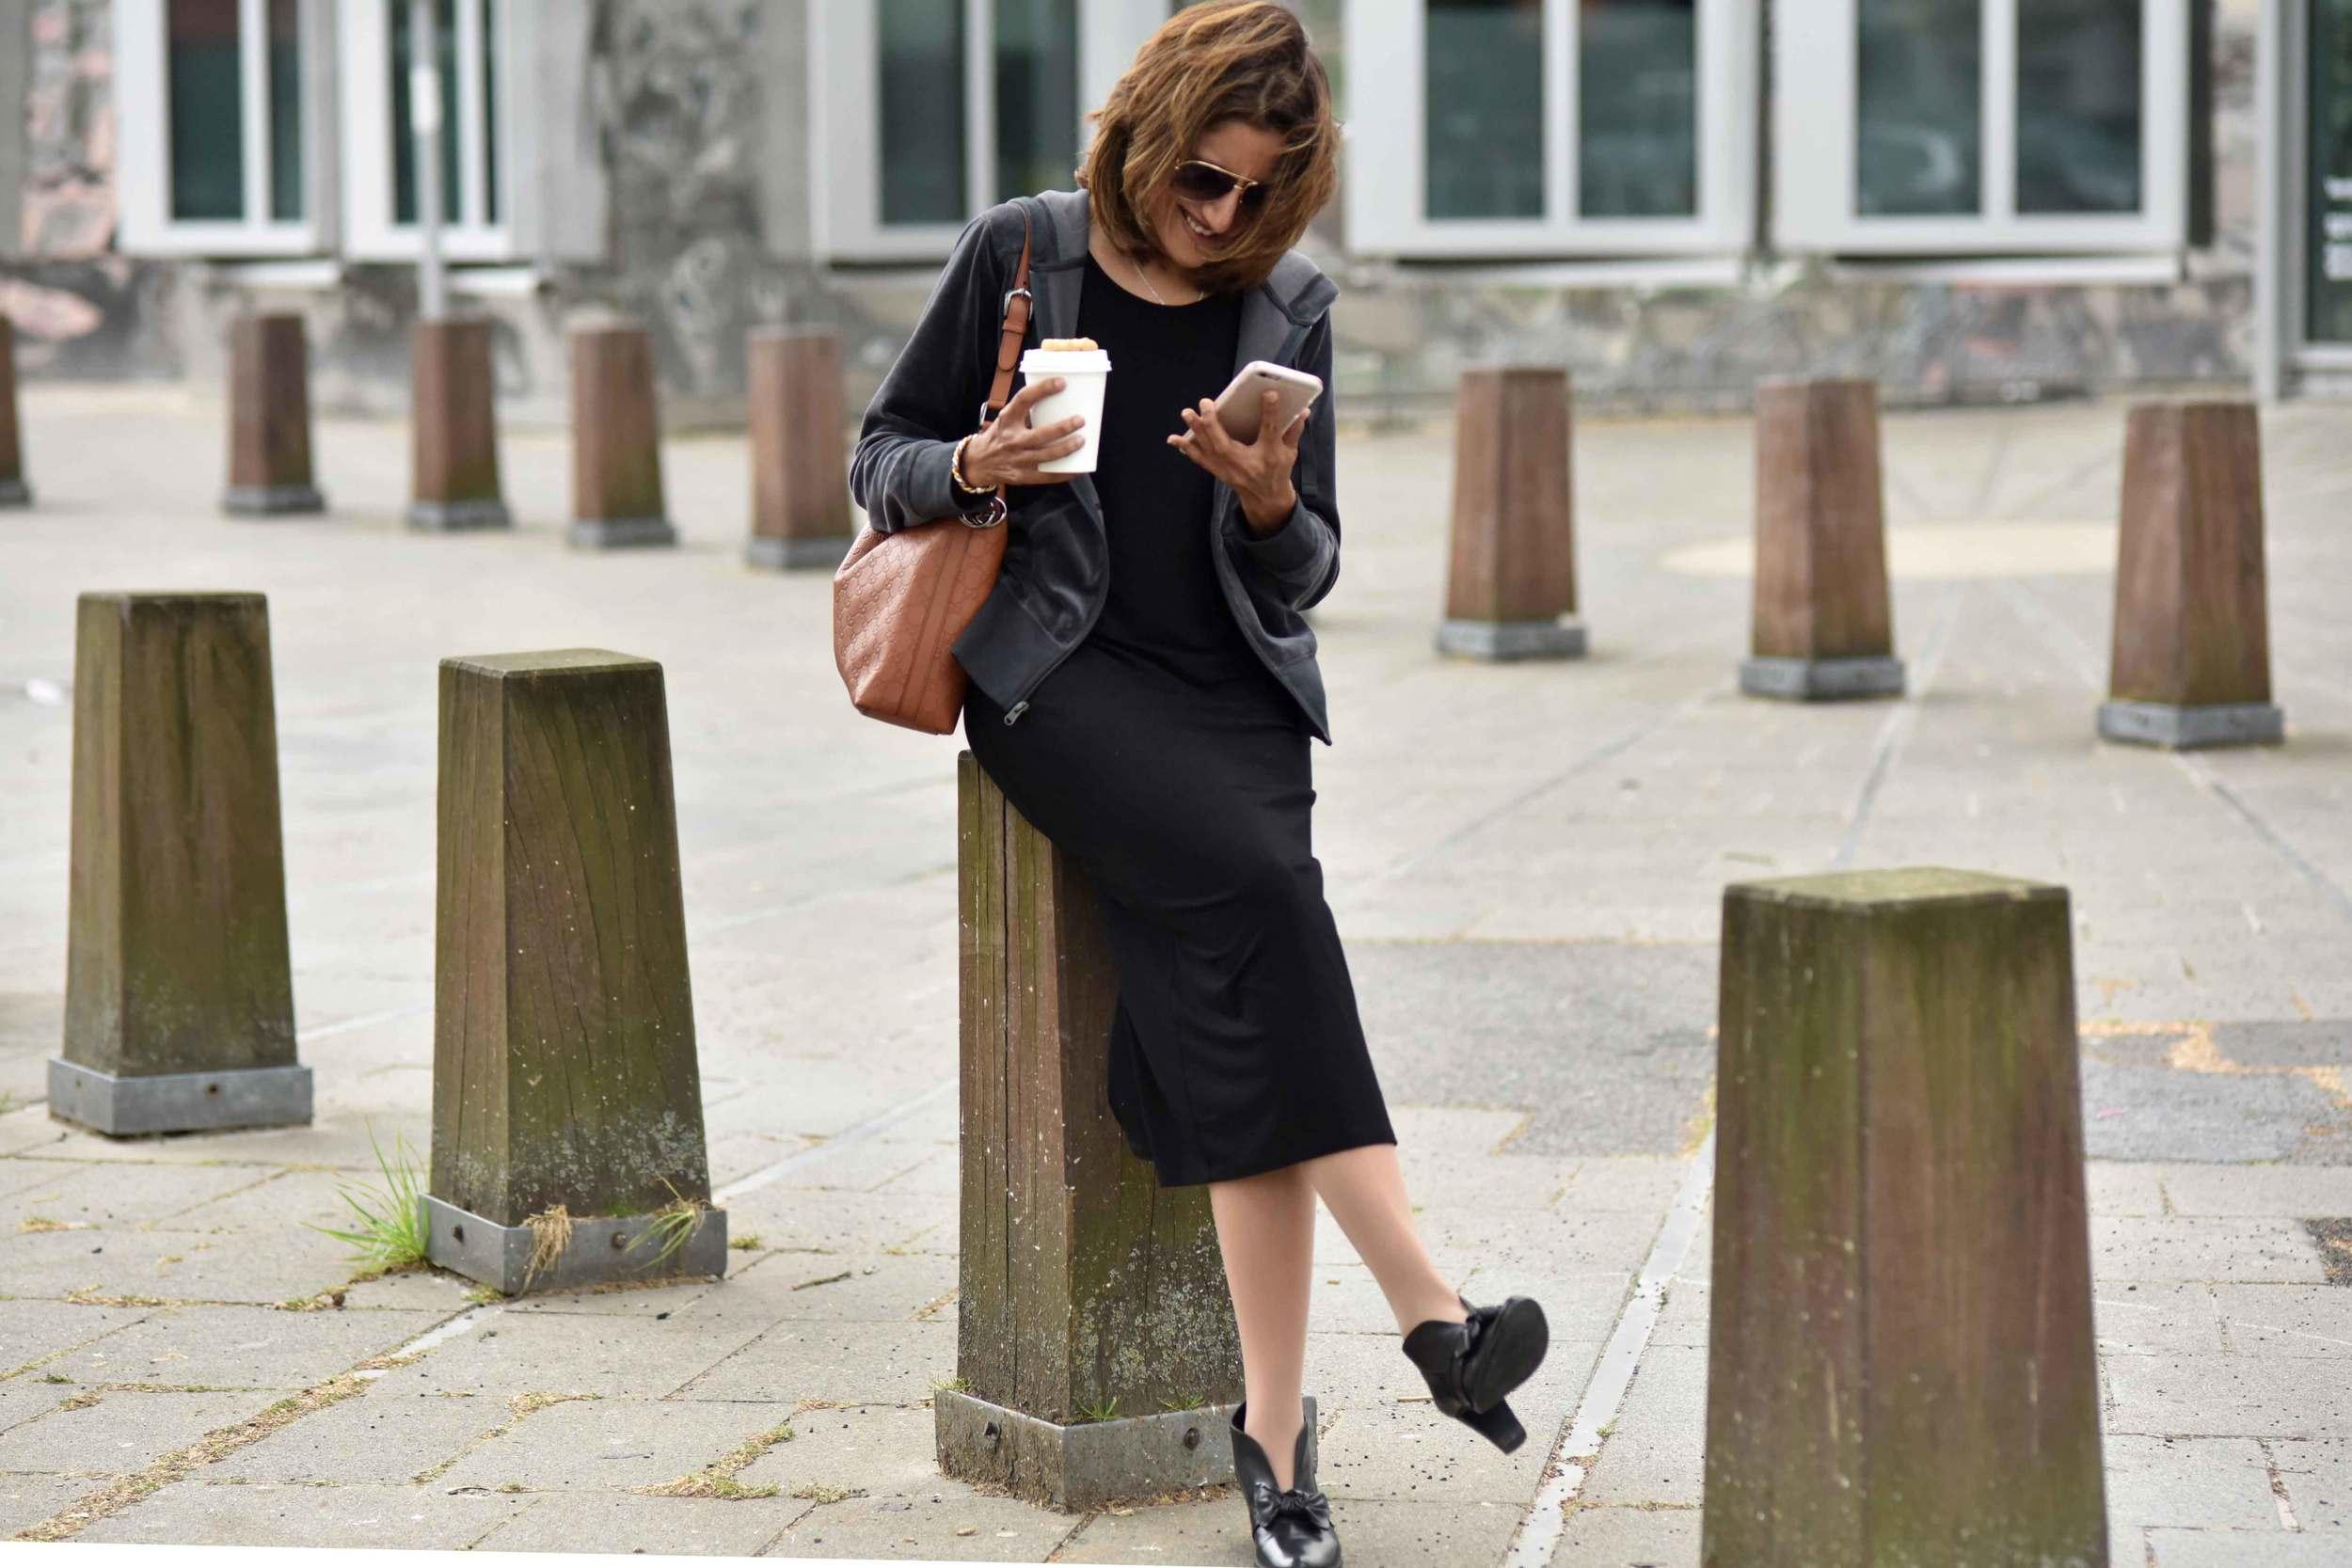 Wearing Eileen Fisher black tank dress in viscose jersey, little black dress, Gucci handbag, Eddie Bauer velour jacket, Düsseldorf city, Germany. Image©sourcingstyle.com, Photo: Nicola Nolting.